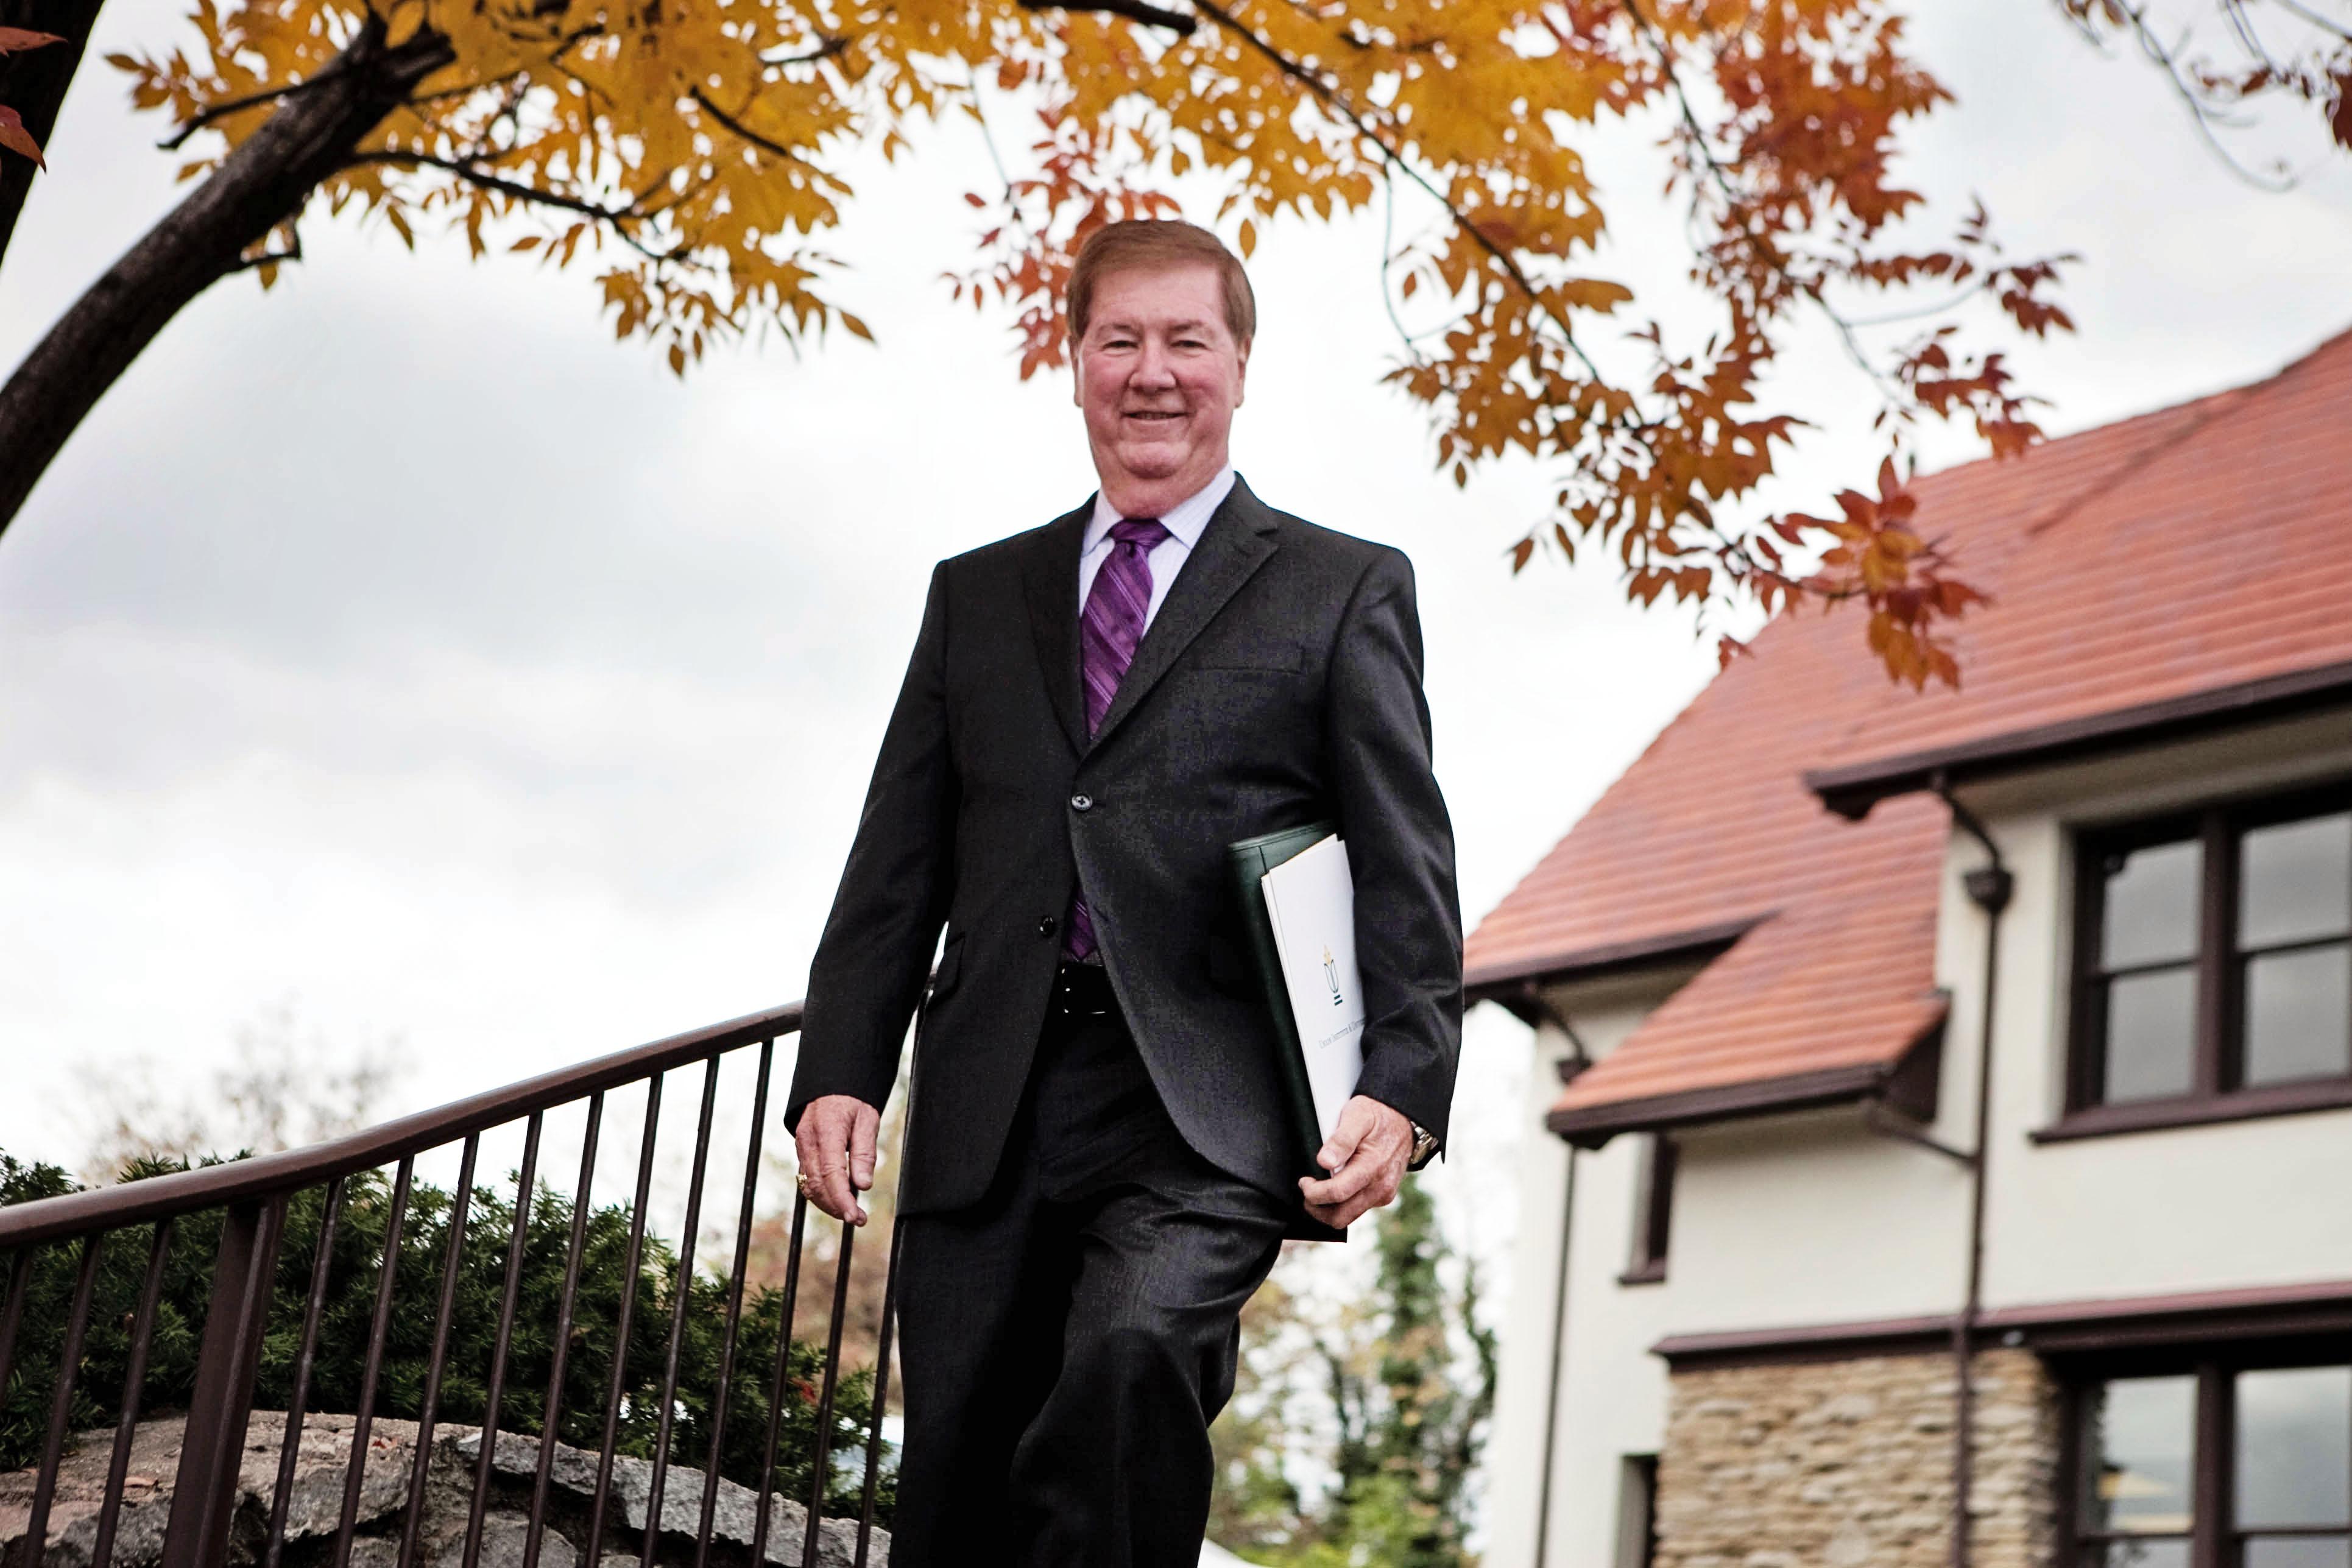 Dr. Roger Sublett